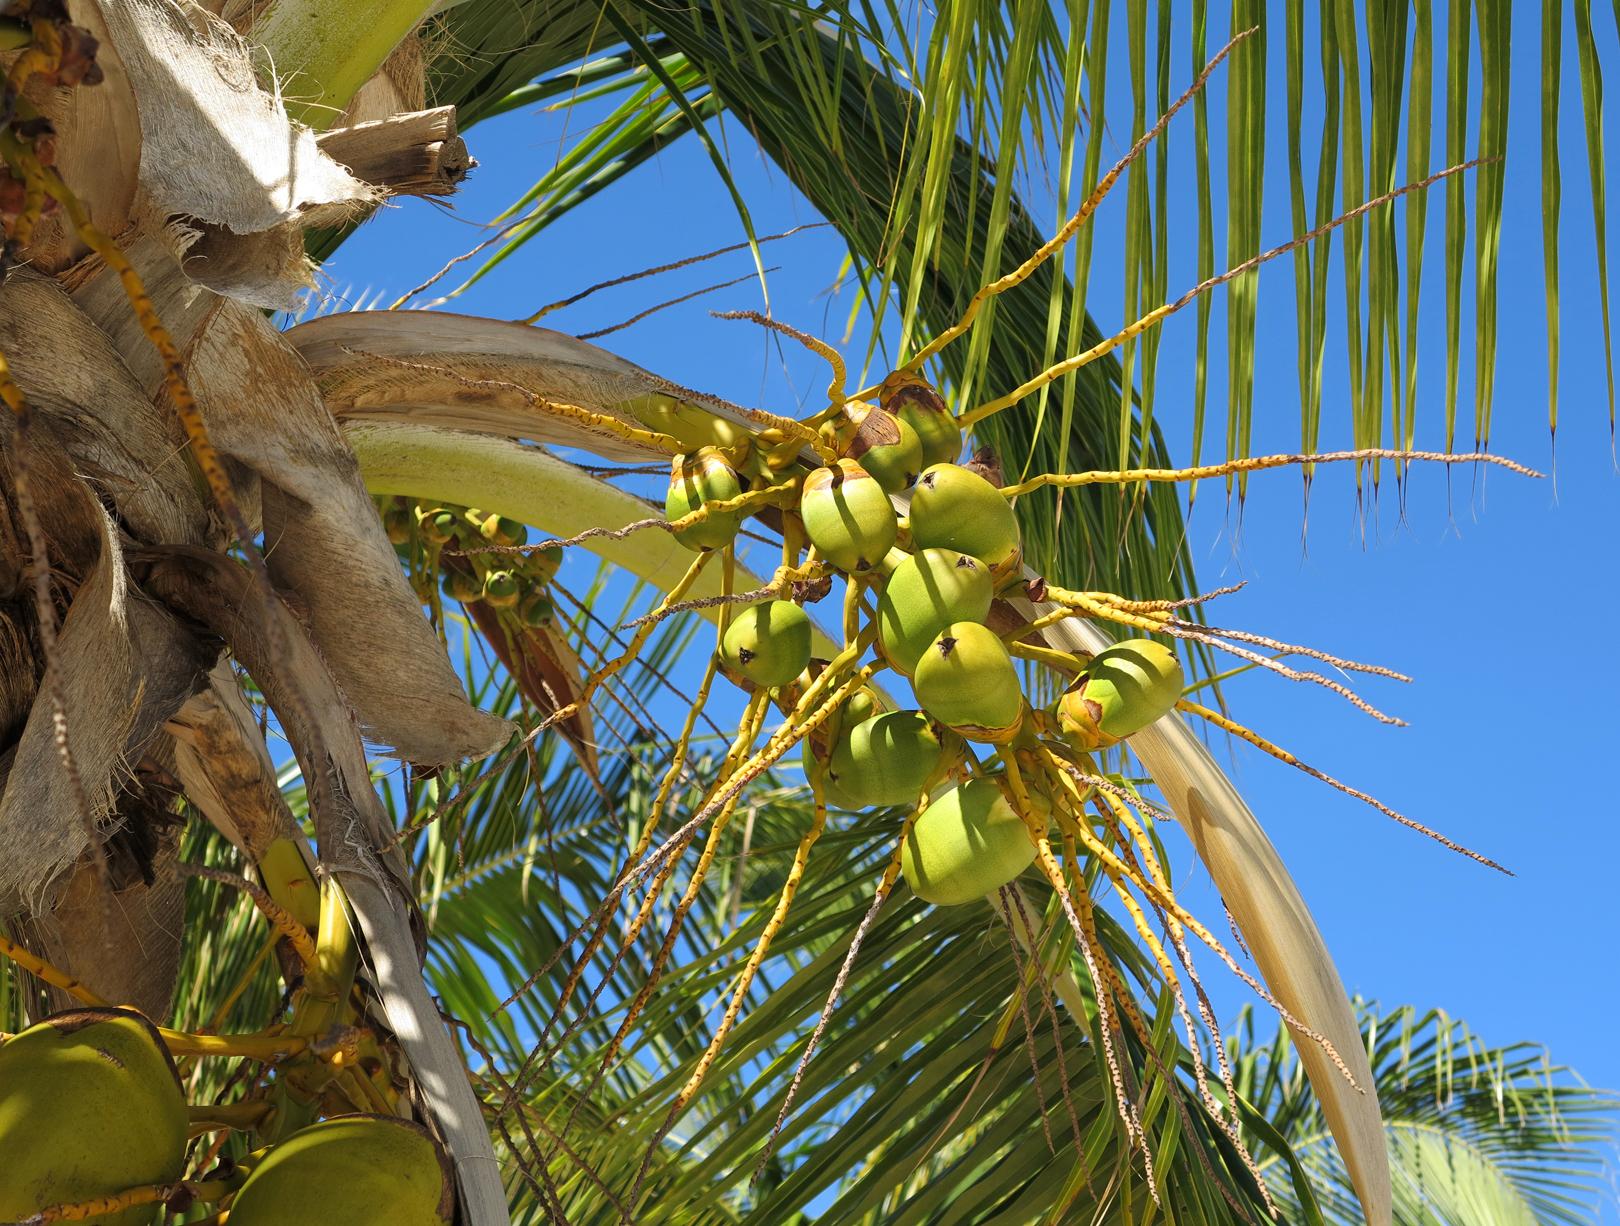 Coconuts - Green Turtle Cay, Abaco, Bahamas